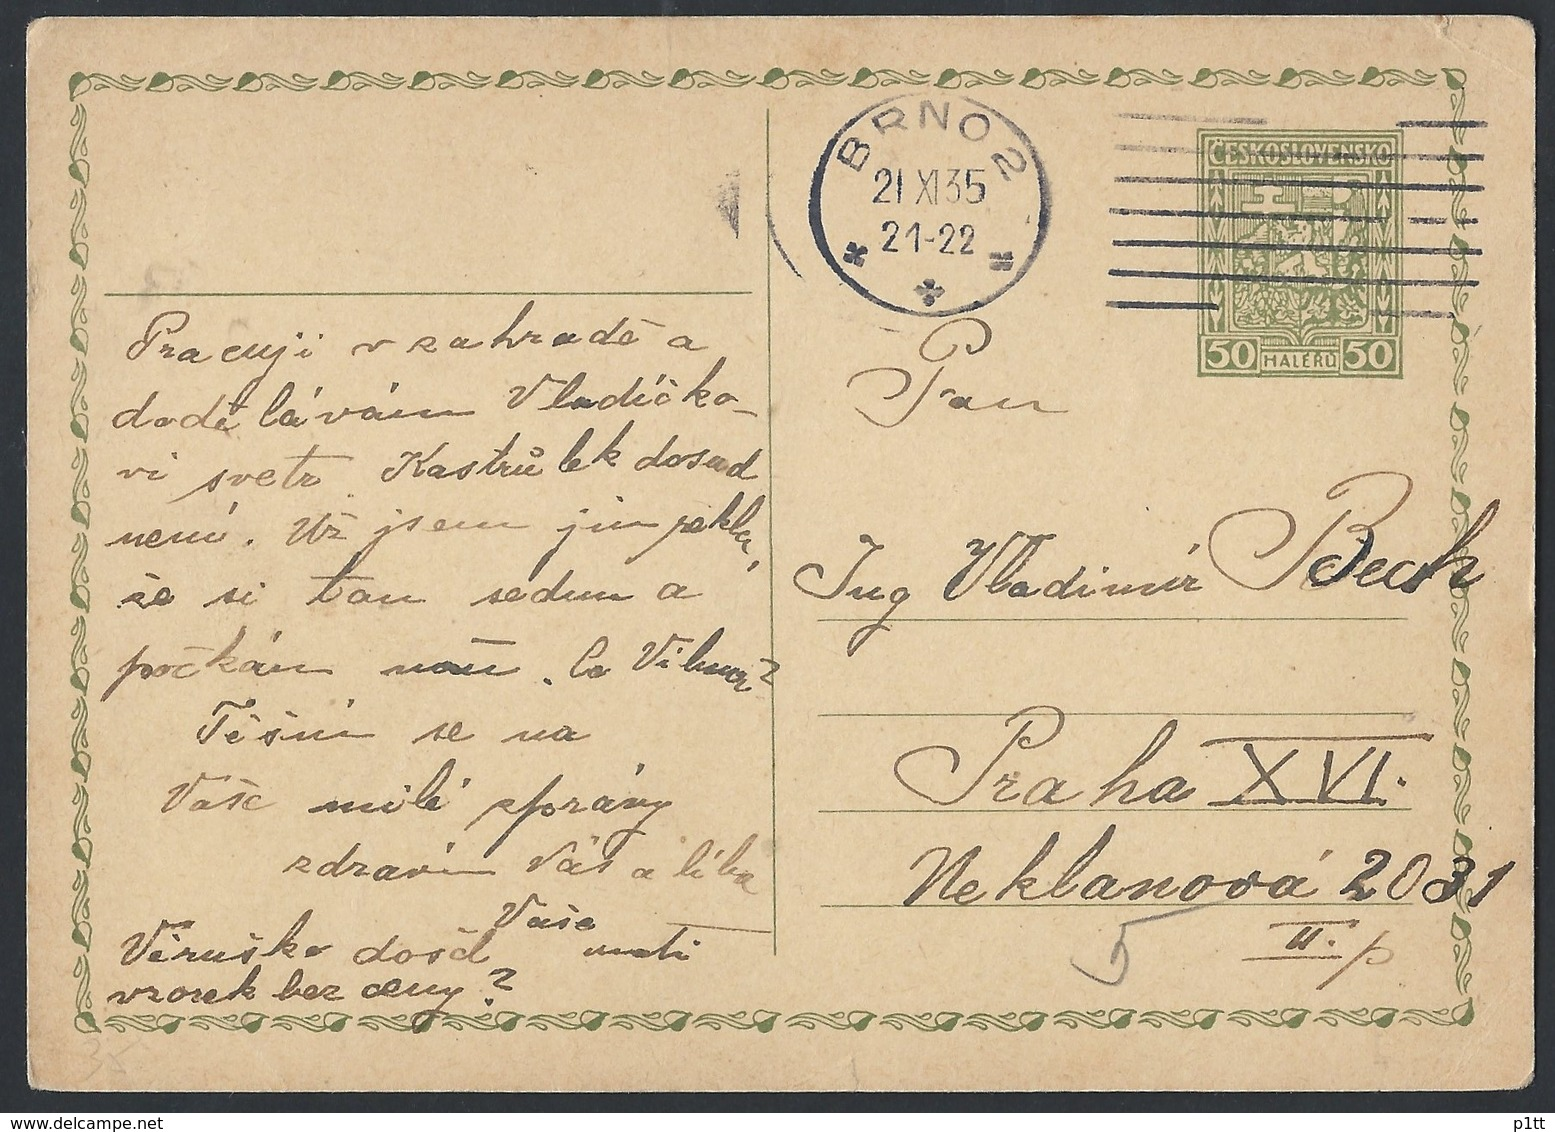 6ch.Postcard. Post 1935. Brno Prague. First Czechoslovak Republic. - Czechoslovakia